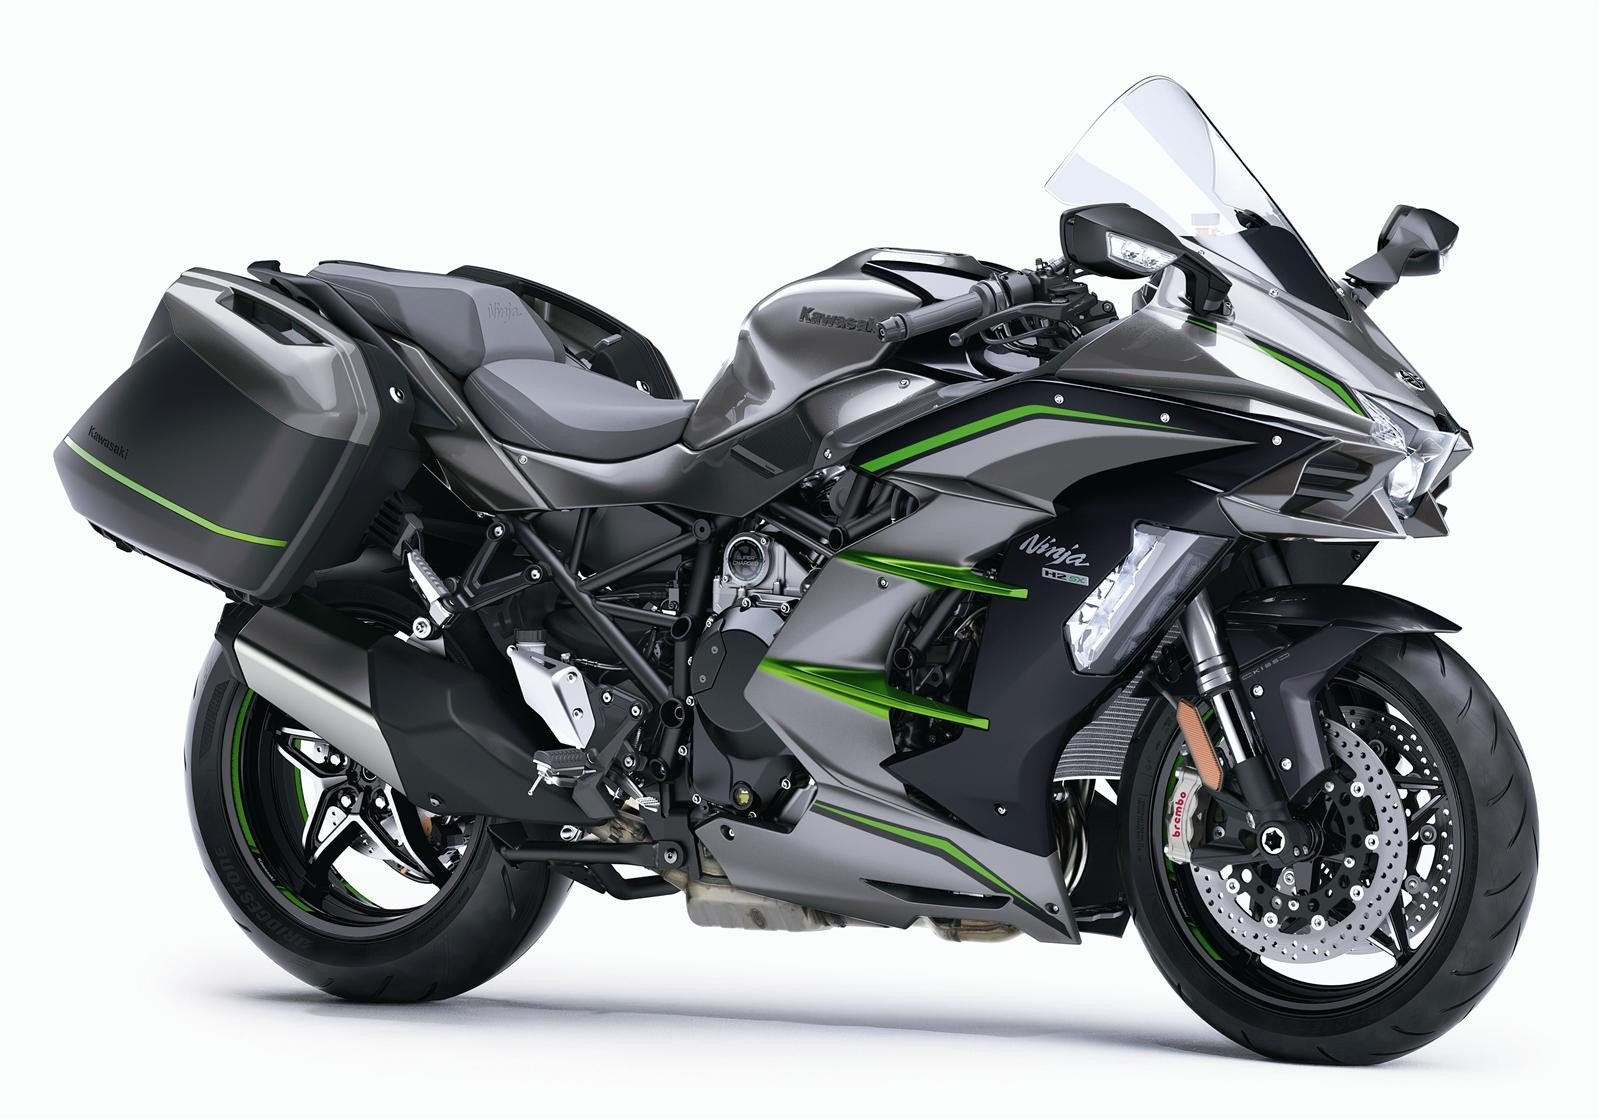 New 2019 Kawasaki Ninja H2 SX SE+ Tourer*£1000 Deposit PAID* For Sale (picture 1 of 6)